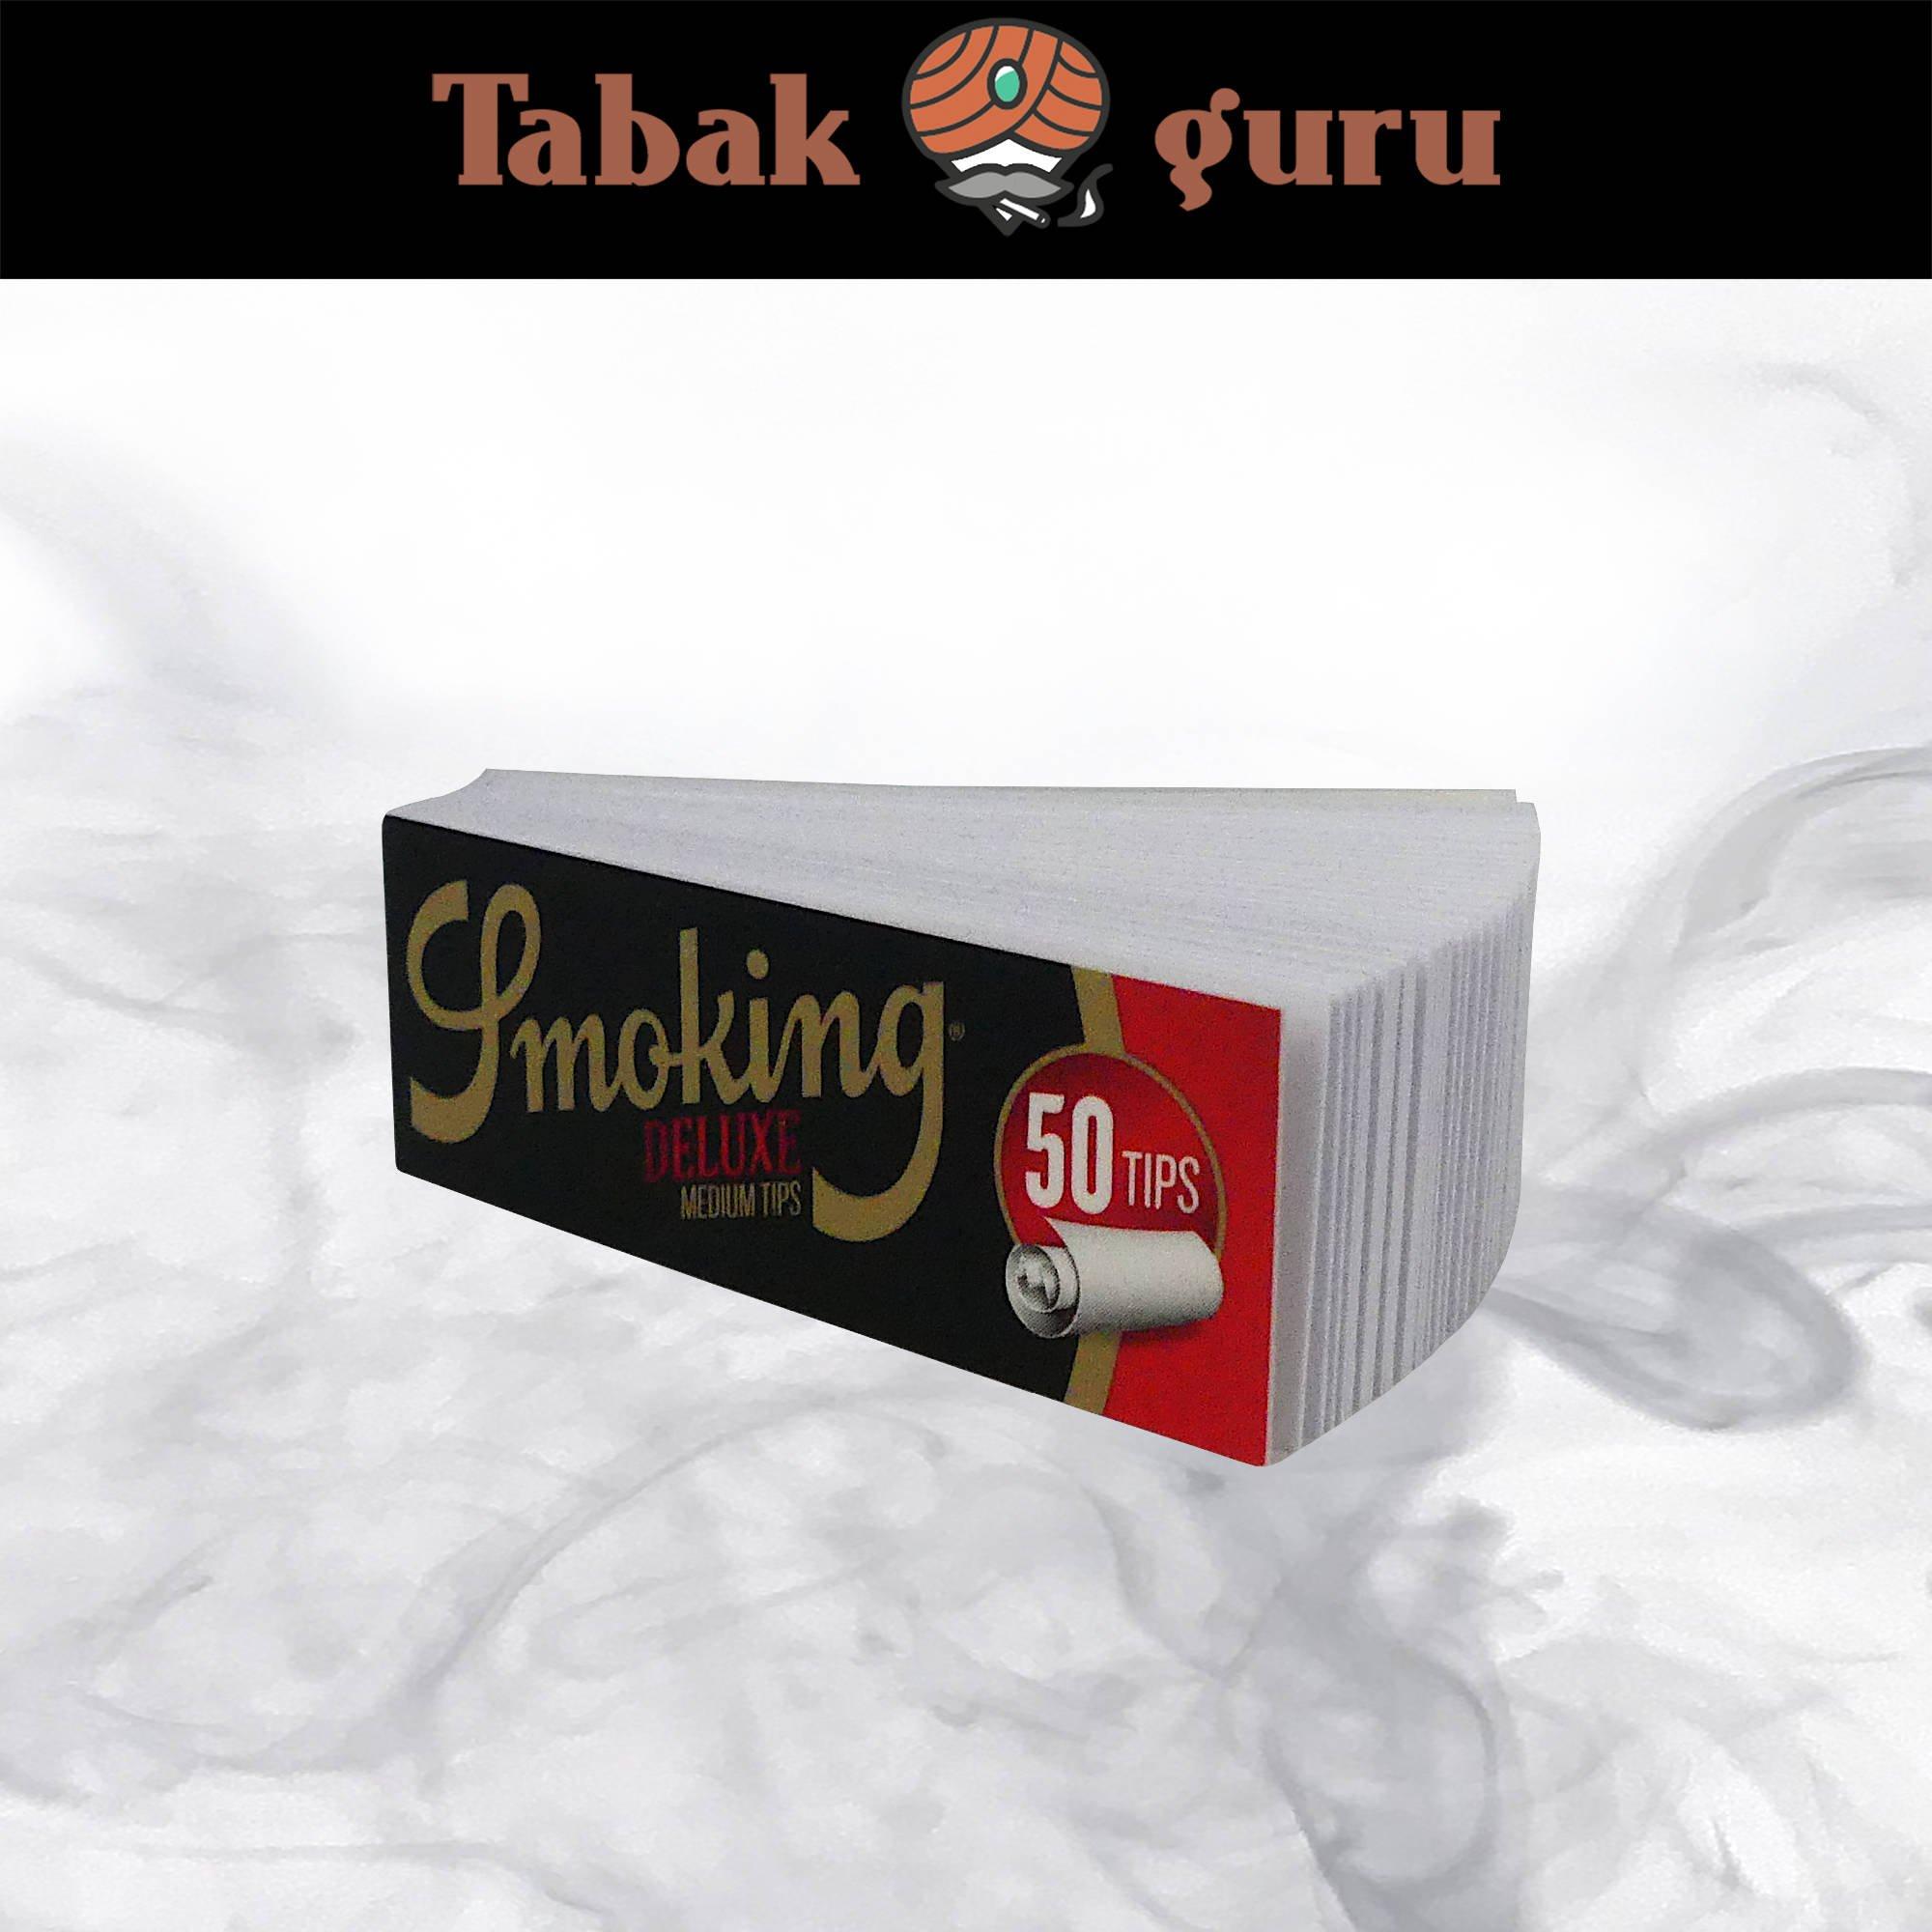 Smoking Medium Size Deluxe Filter Tips á 50 Tips